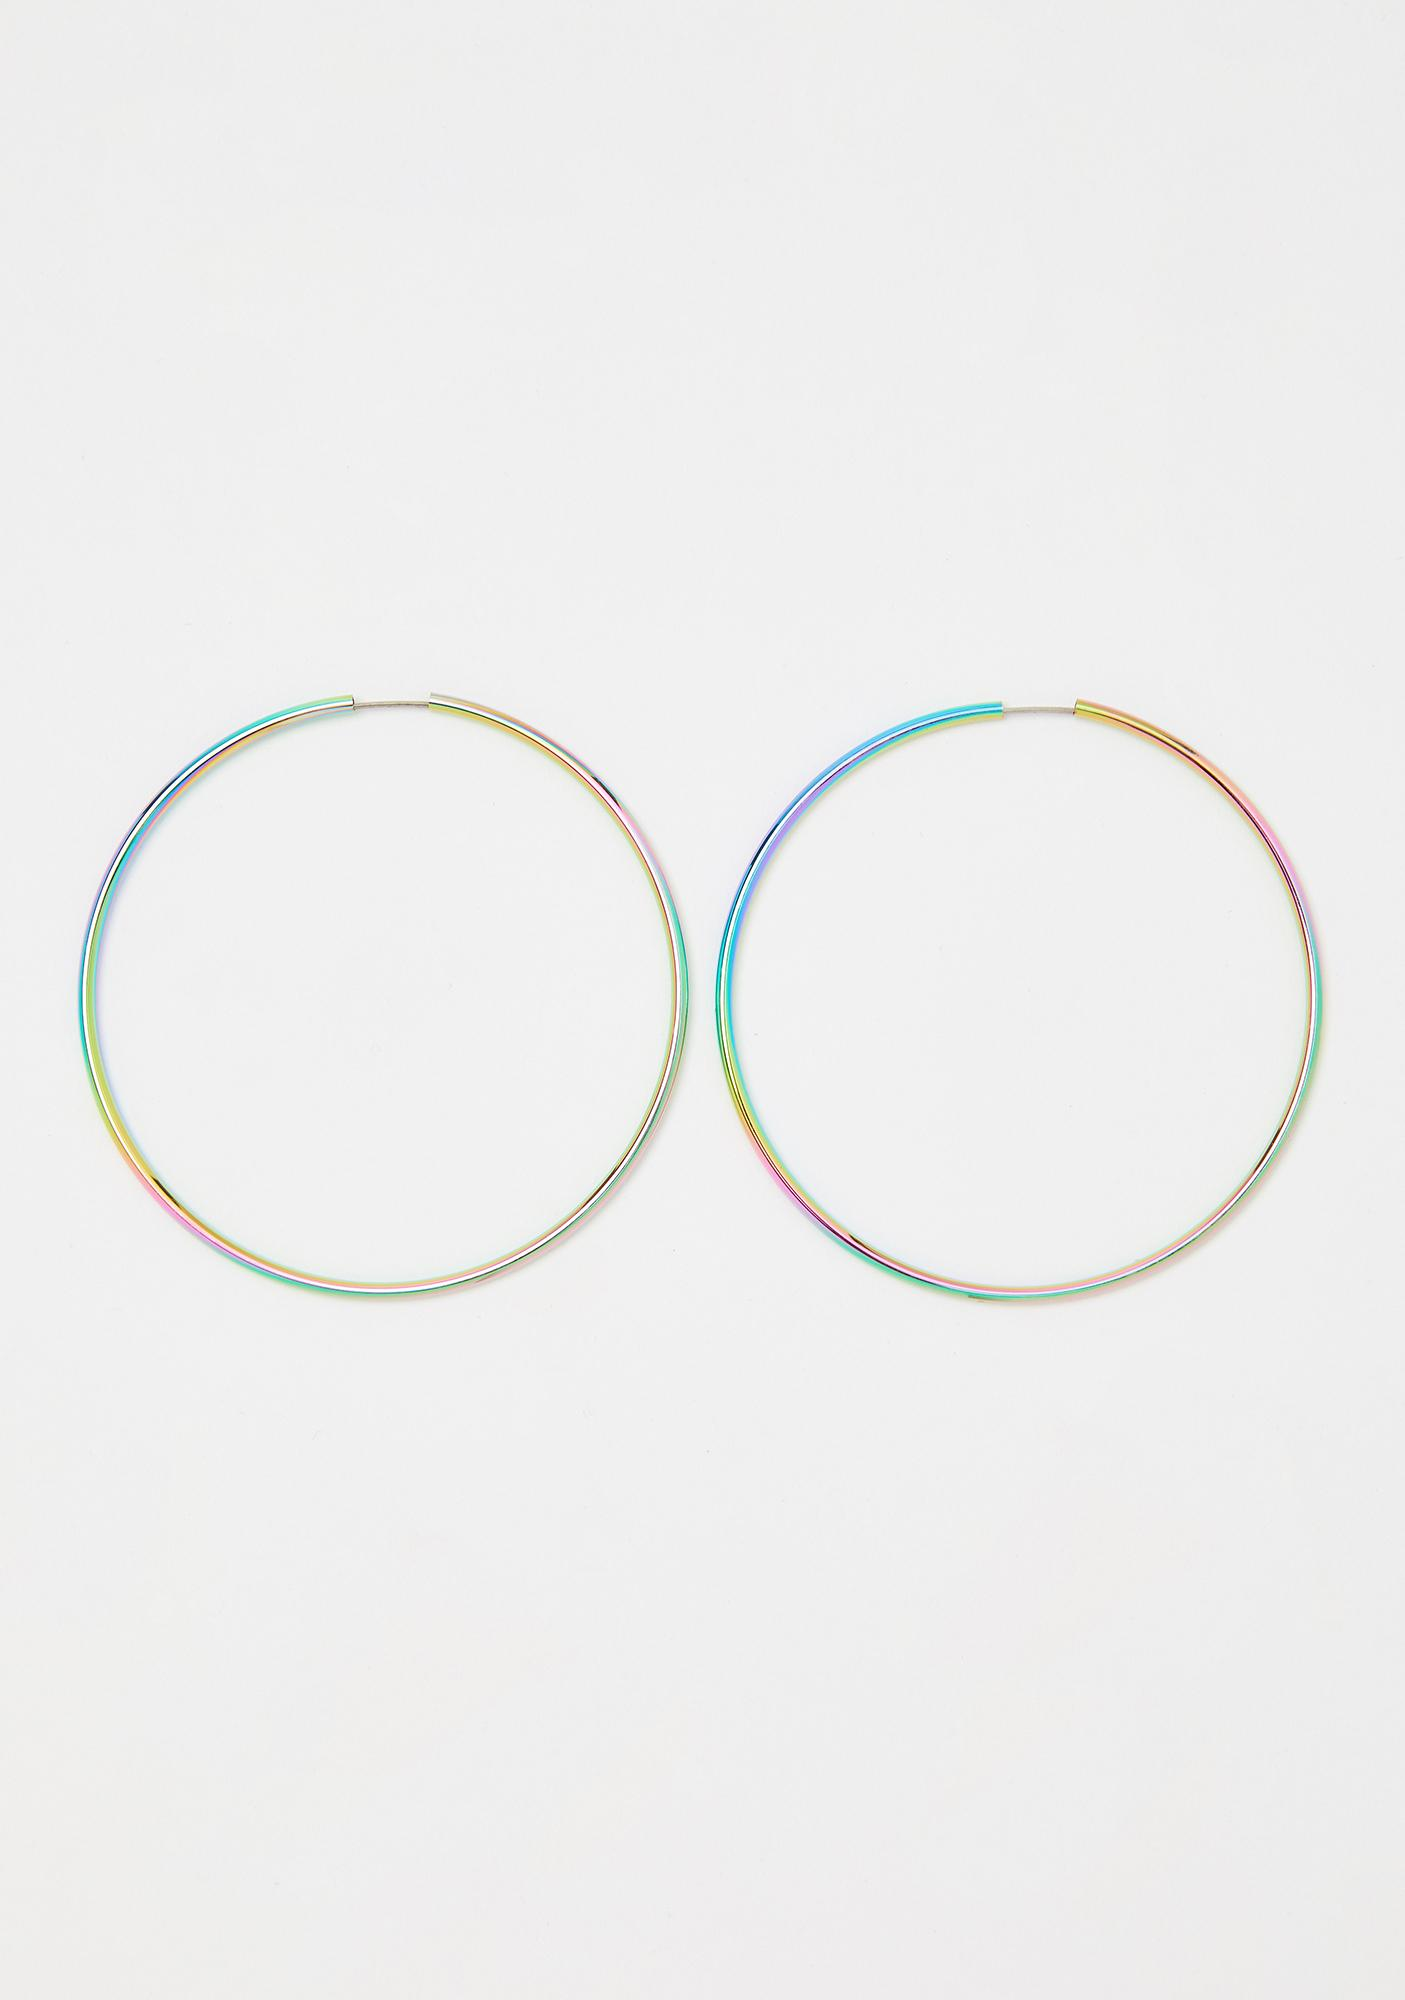 Dark Euphoria Prism Iridescent Earrings